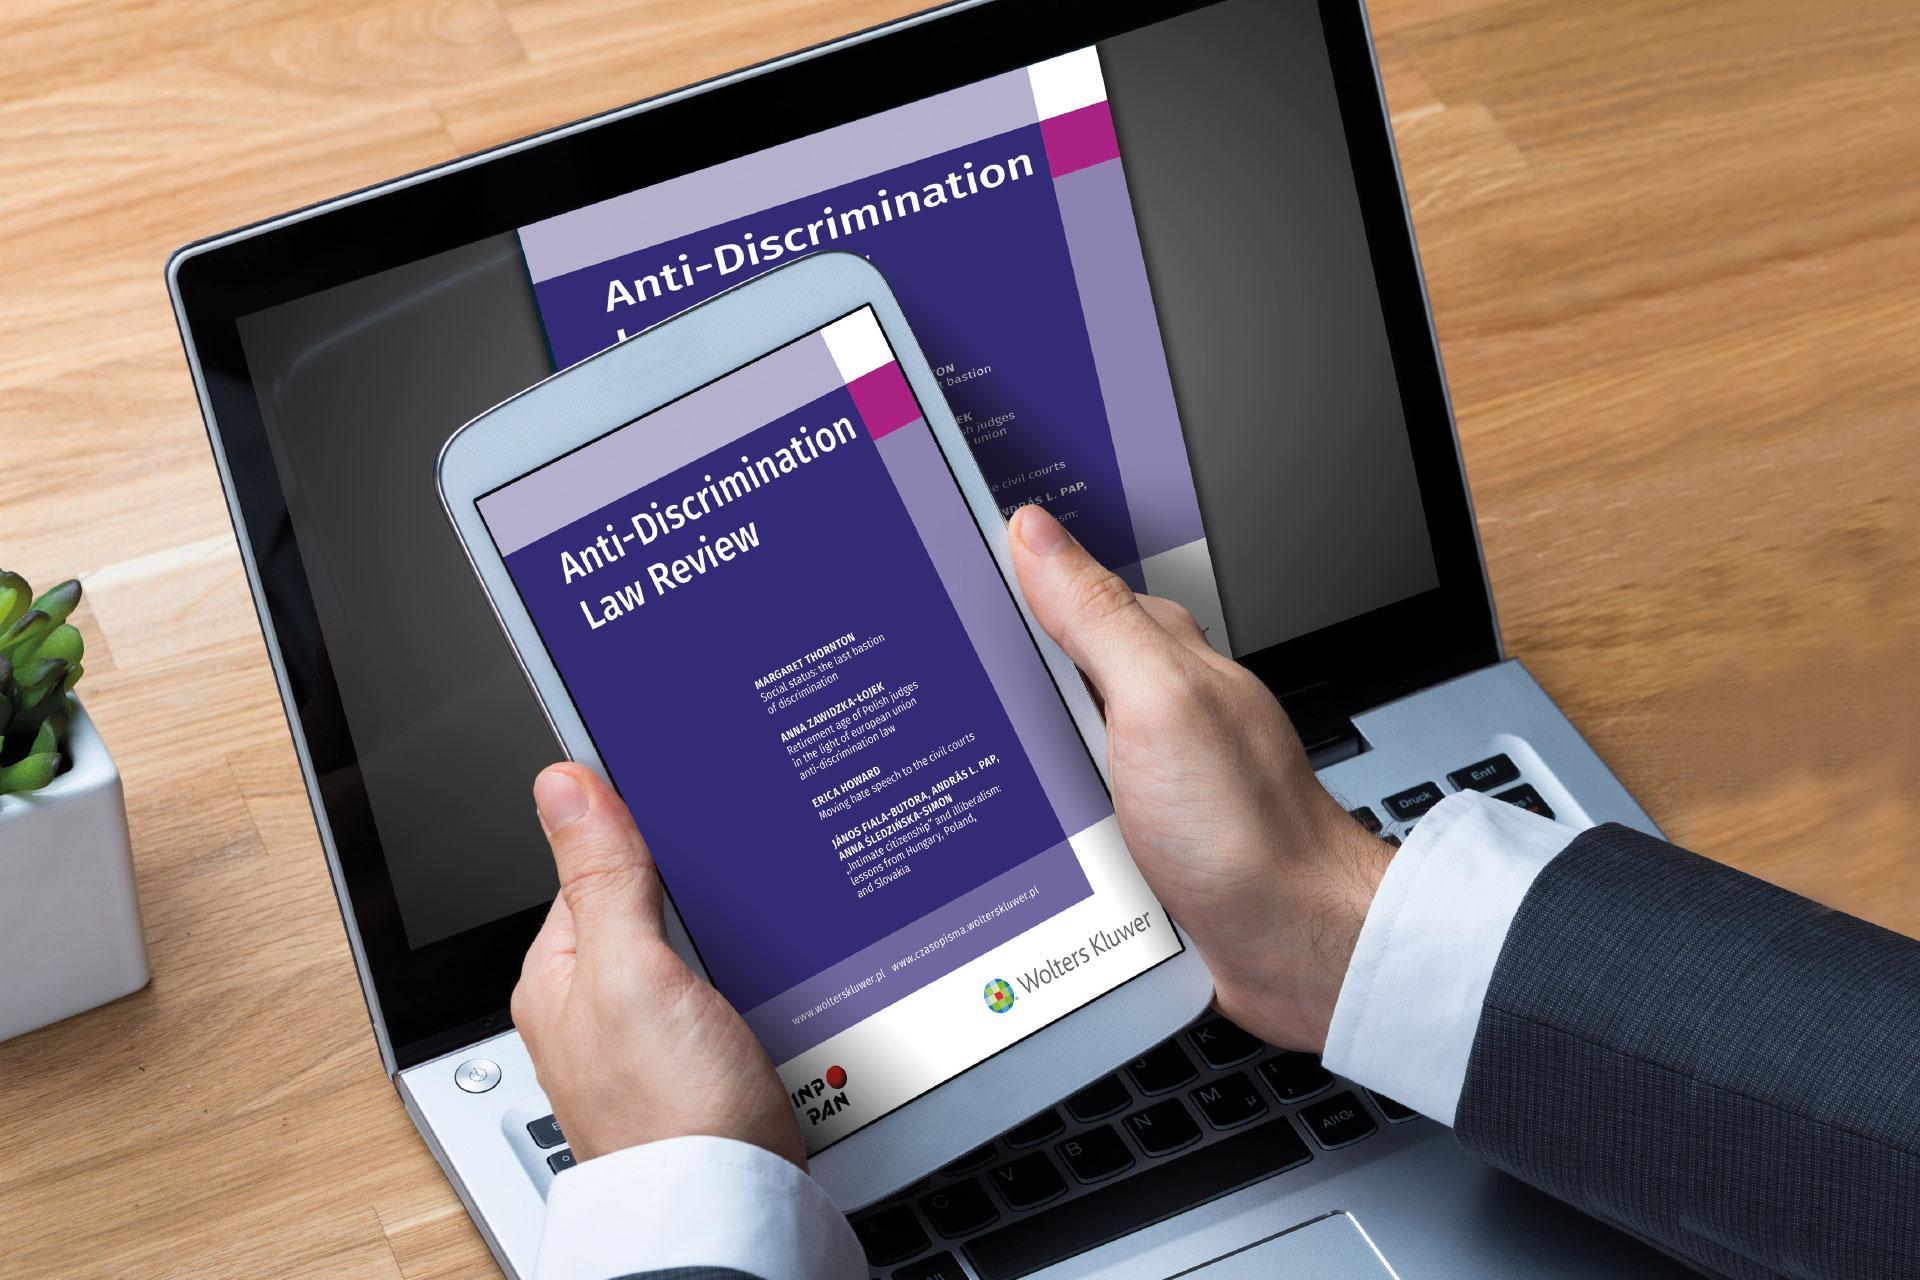 Anti-Discrimination Law Review